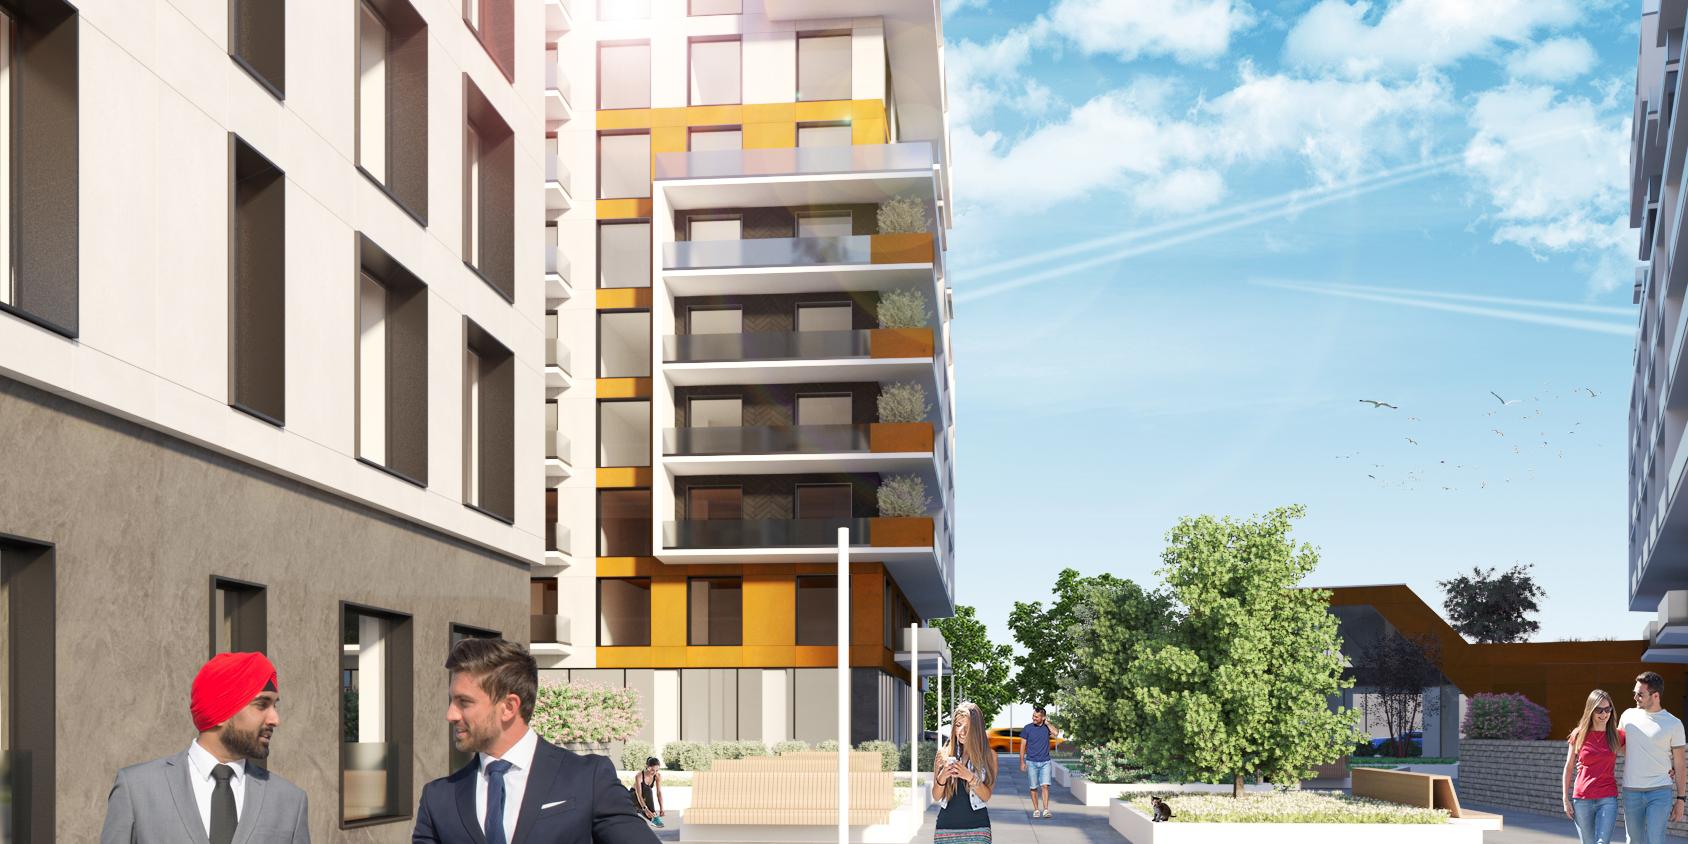 https://nbc-arhitect.ro/wp-content/uploads/2020/10/NBC-Arhitect-_-residentials-_-Glucoza-Residence-2-_-Bucharest-Romania_9.jpg